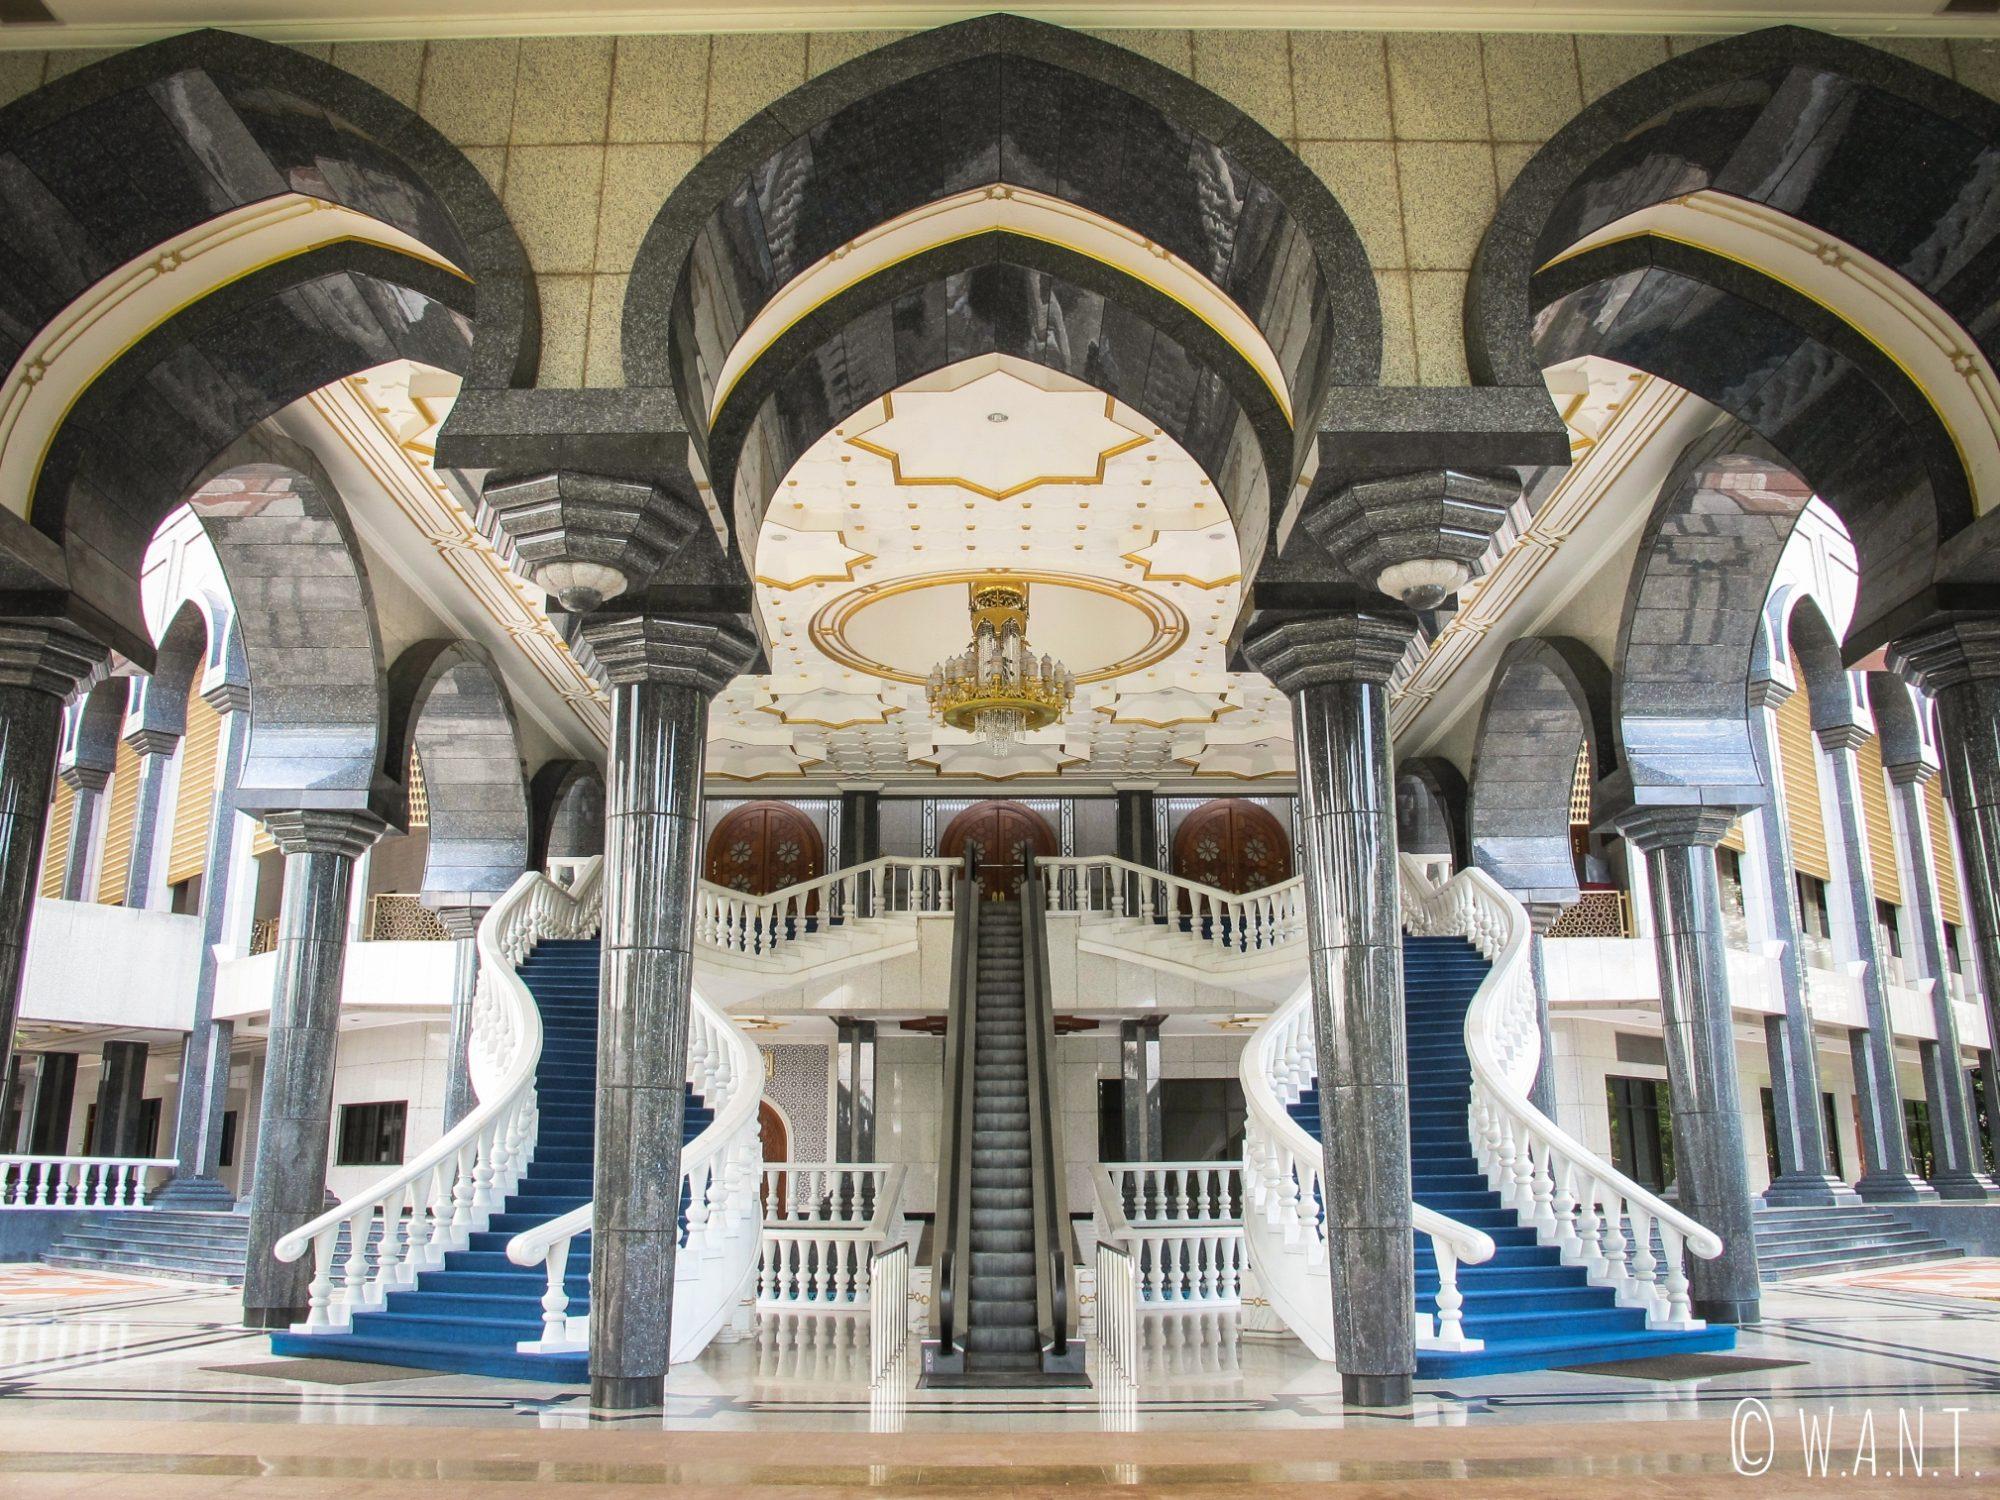 Magnifique architecture de la mosquée Masjid Jame'Asr Hassanil Bolkiah de Bandar Seri Begawan